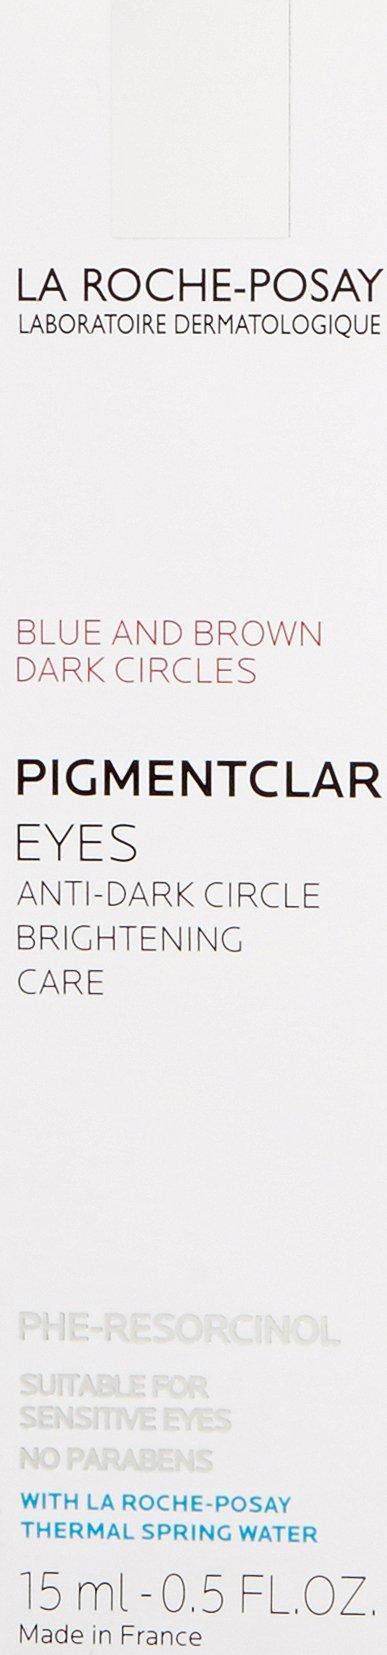 La Roche-Posay Pigmentclar Dark Circles Eye Cream, 0.5 Fl. Oz. by La Roche-Posay (Image #3)